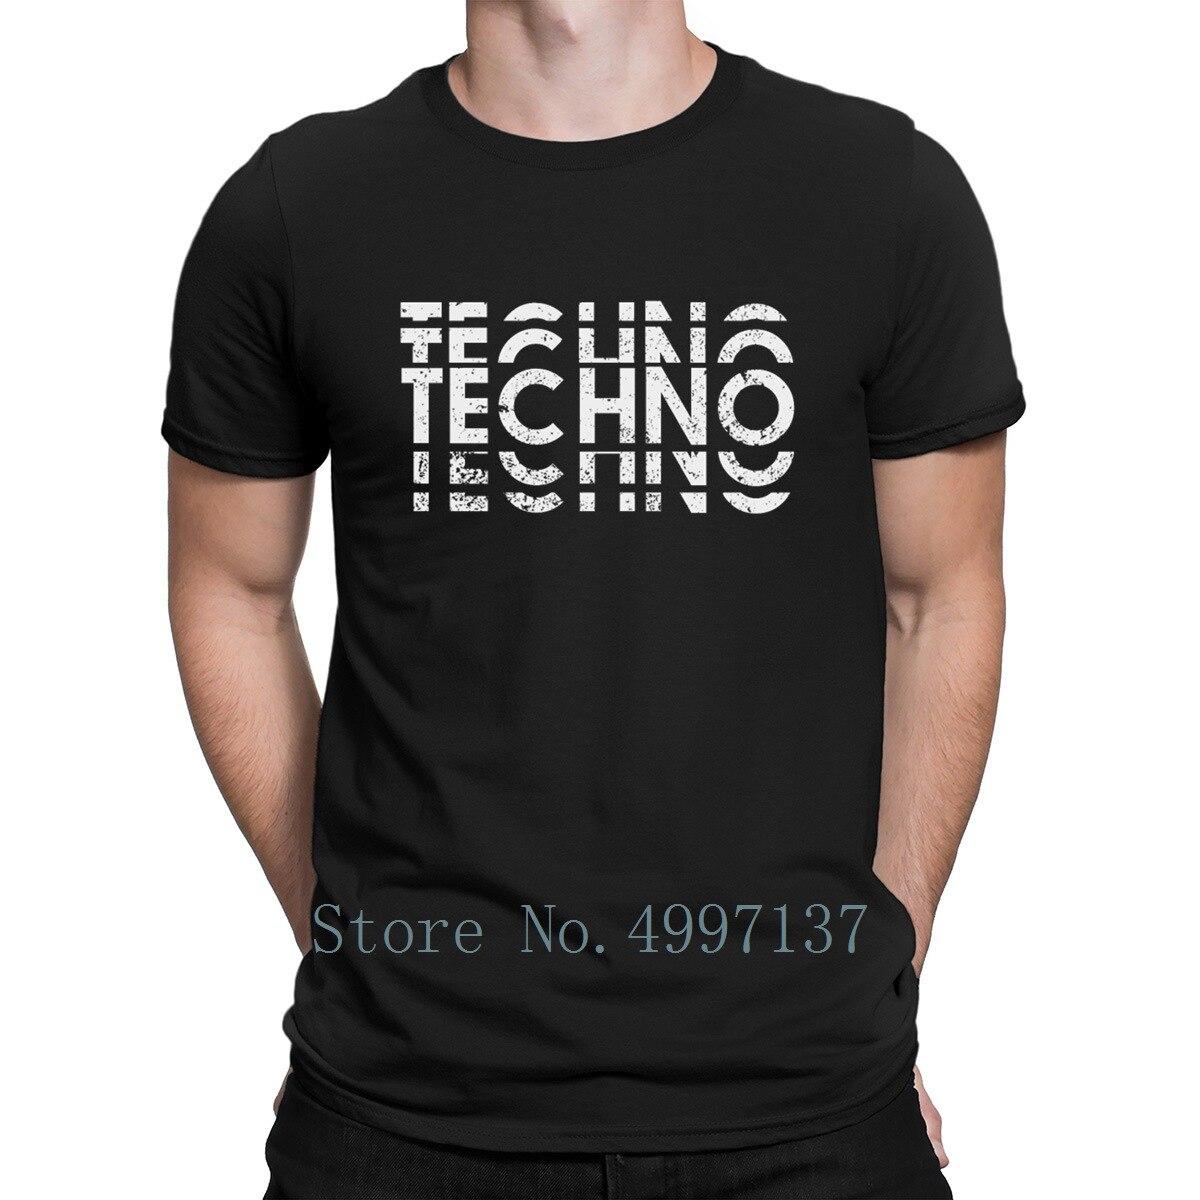 Techno T Shirt Printing Graphic Cool Natural Spring O-Neck Tee Shirt Humor Shirt